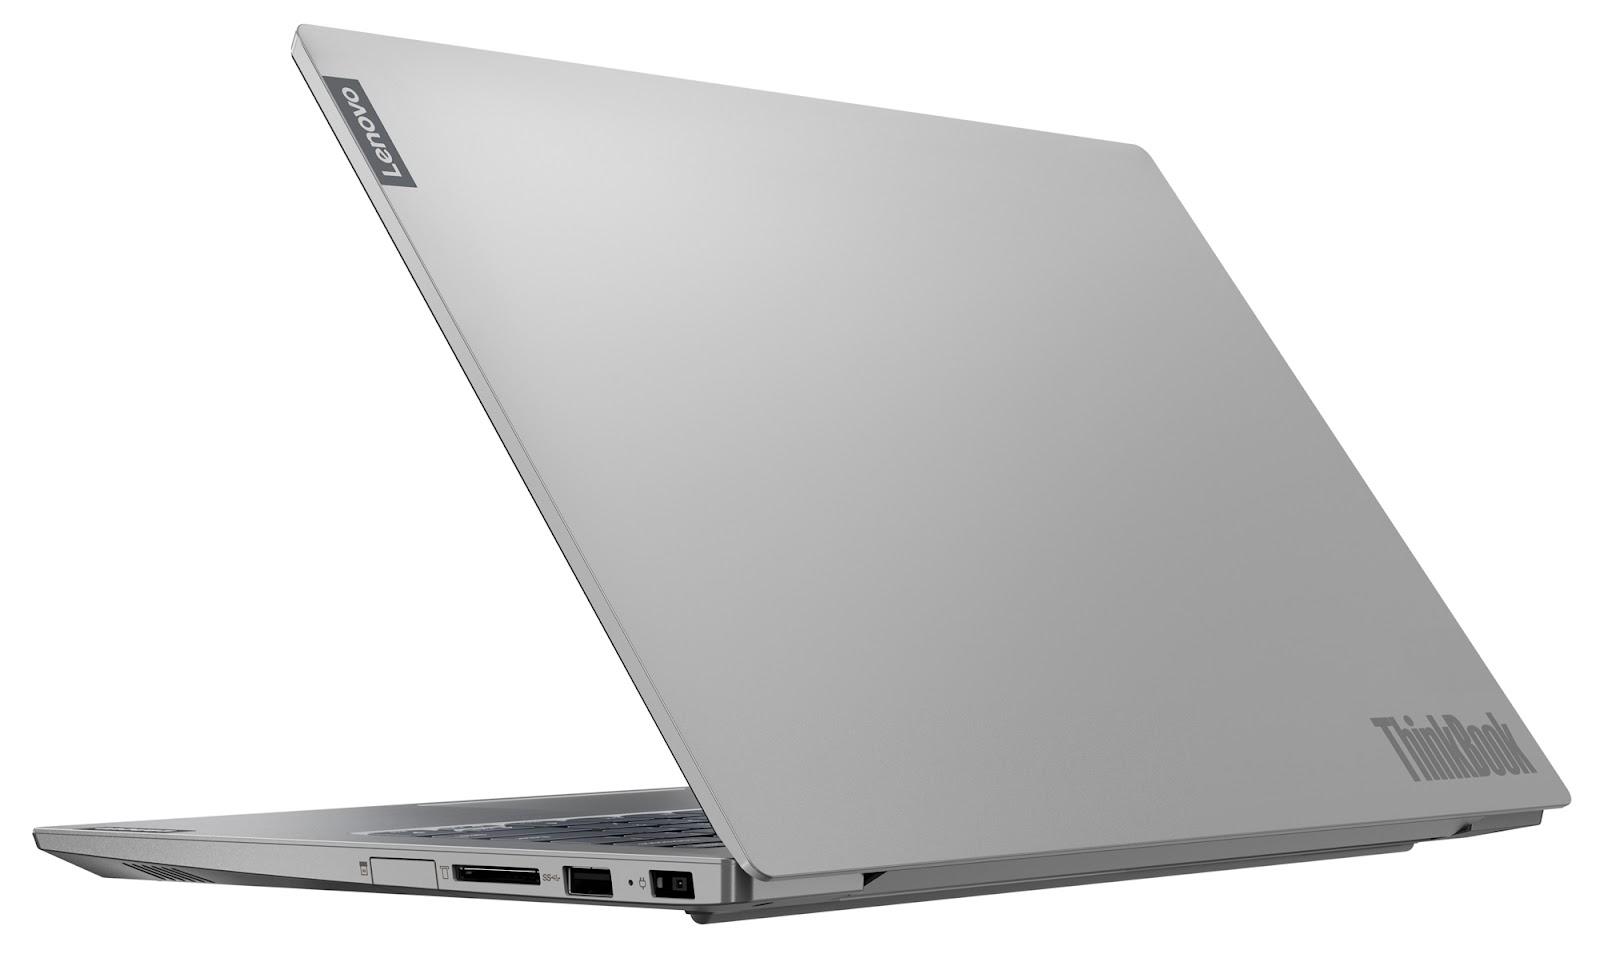 Фото 2. Ноутбук Lenovo ThinkBook 14 IIL (20SL00F5RU)